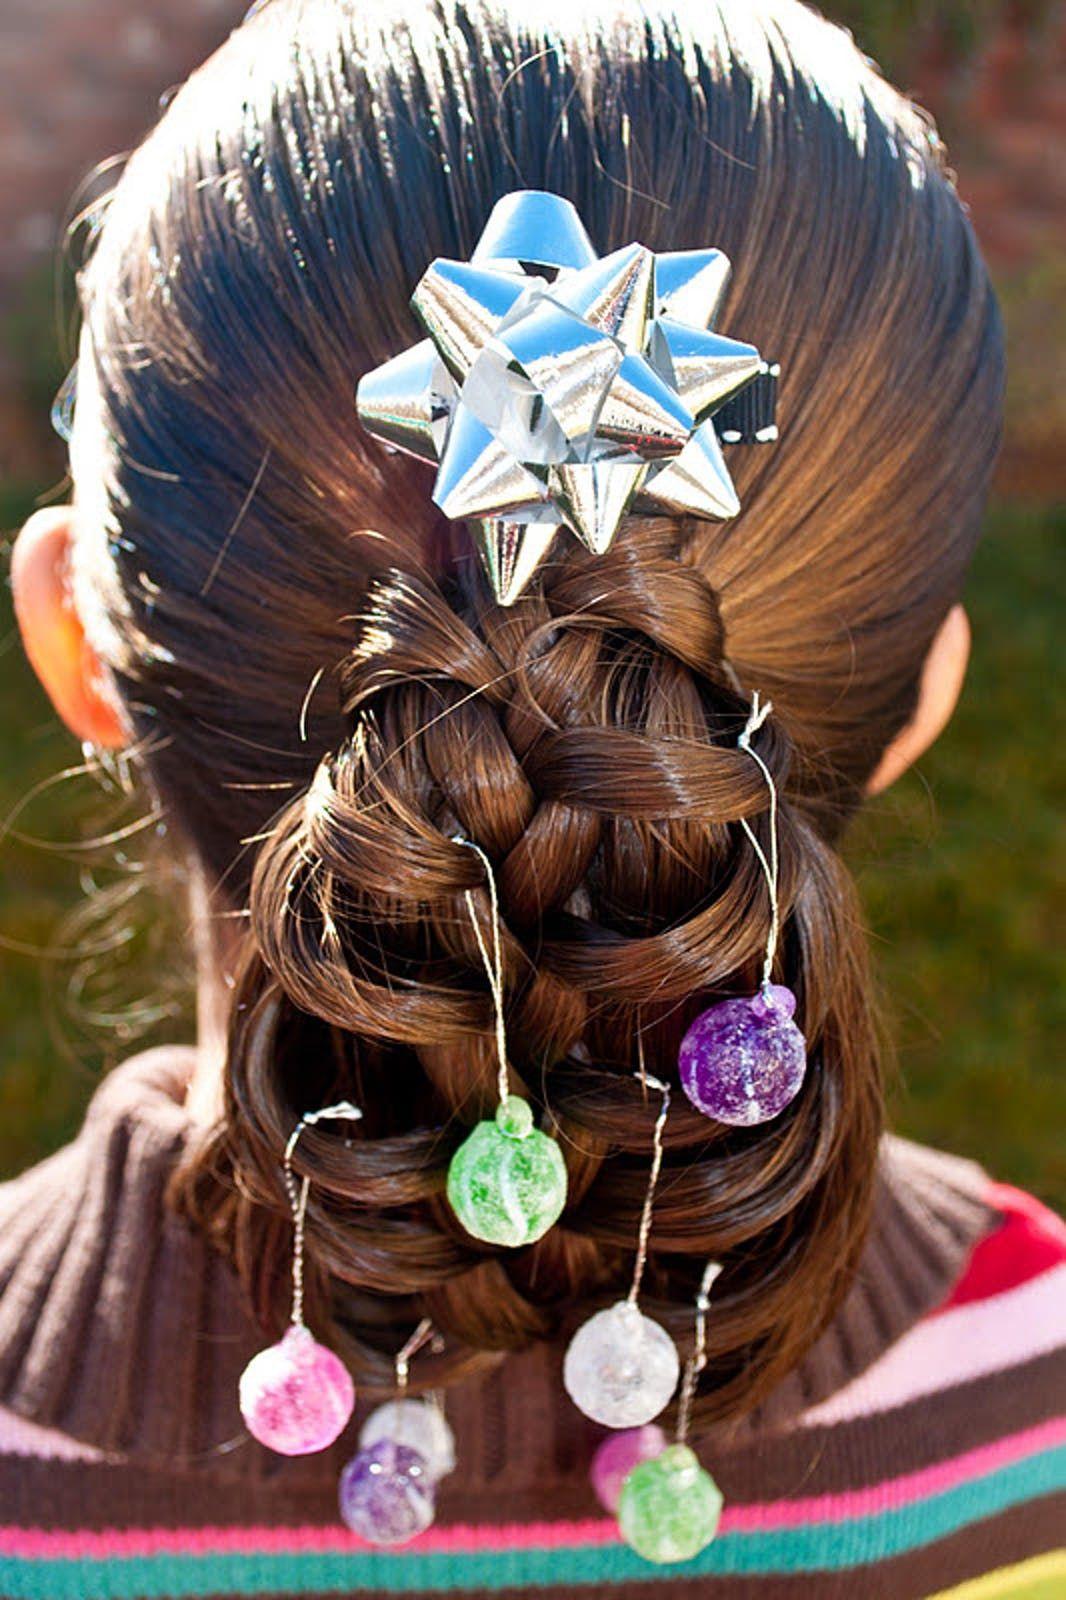 Mode Des Enfants Coiffure De Vacances Coiffure Noel Cheveux De Noel